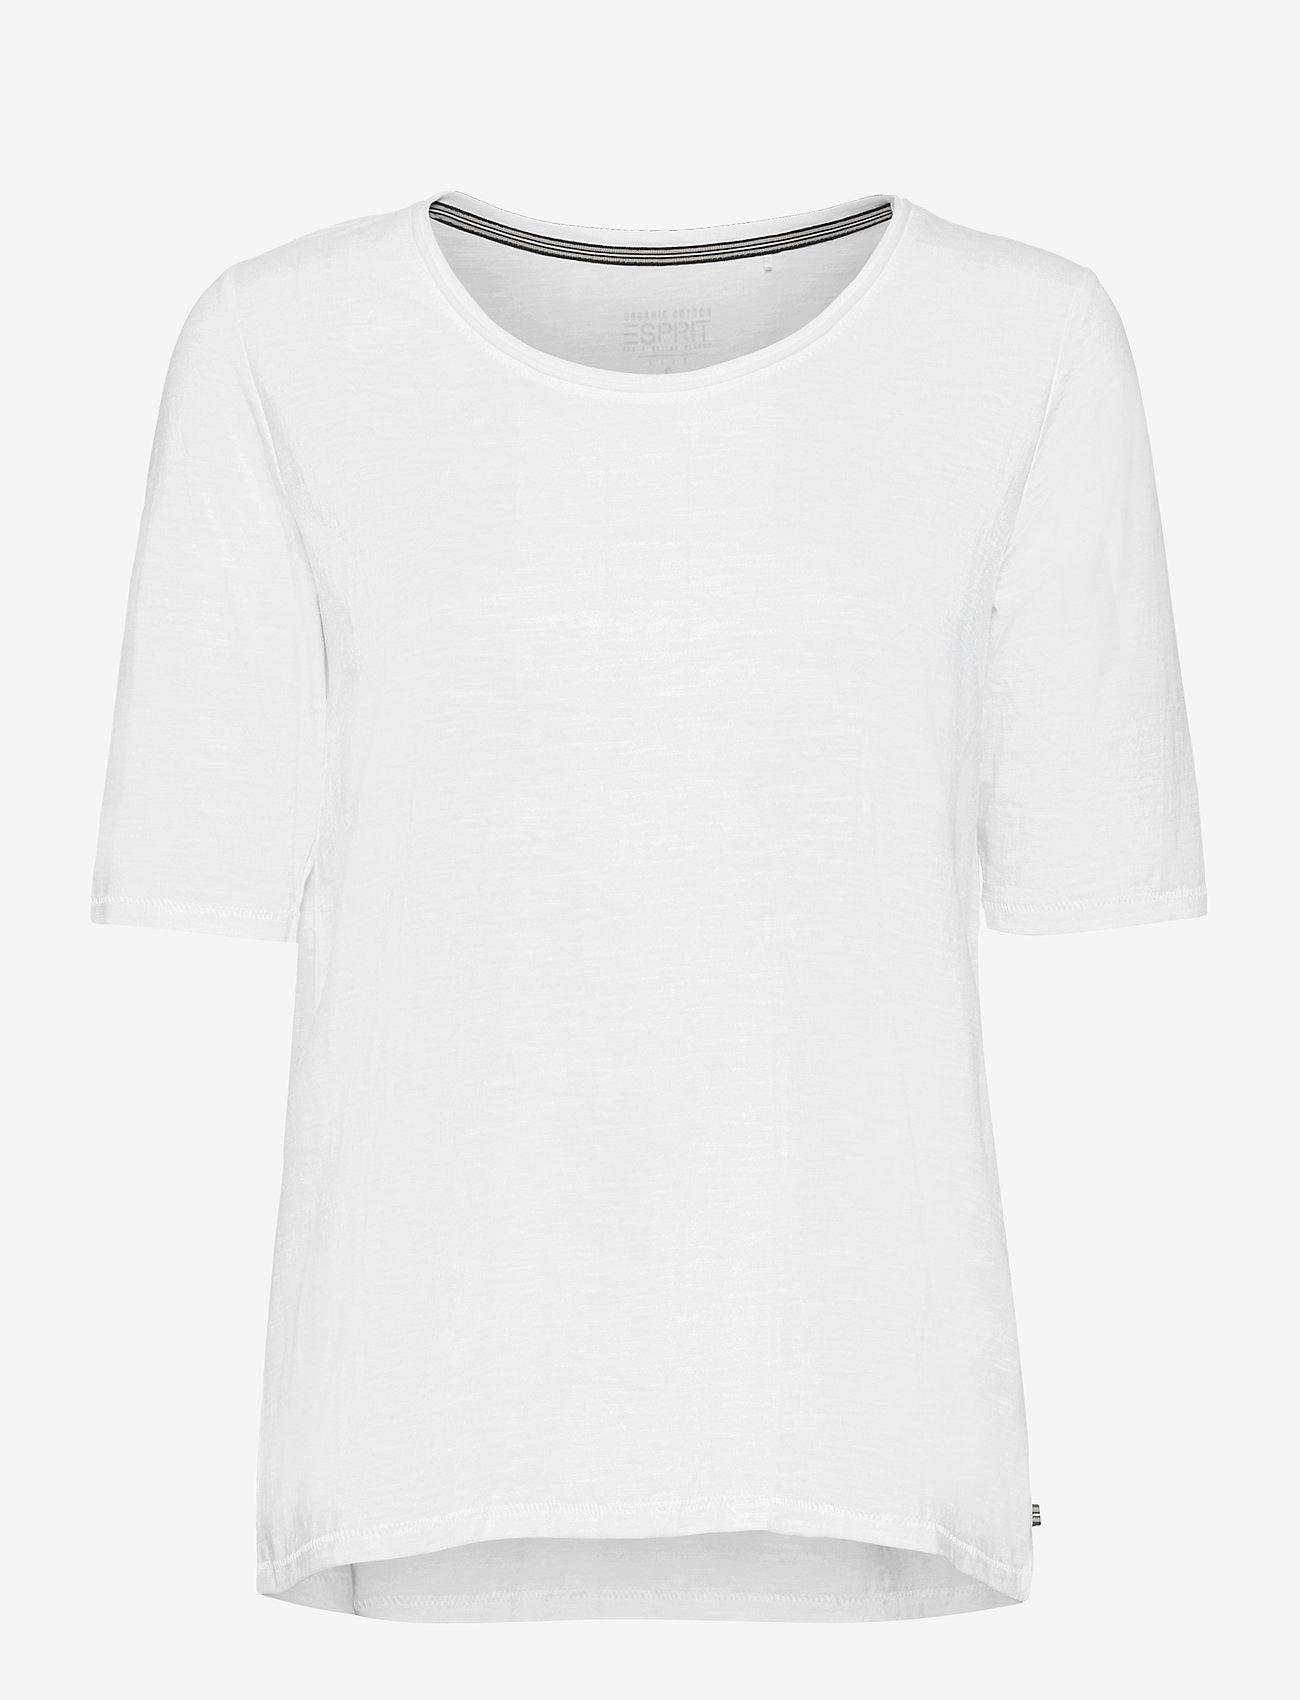 Esprit Casual - T-Shirts - t-shirts - white - 0